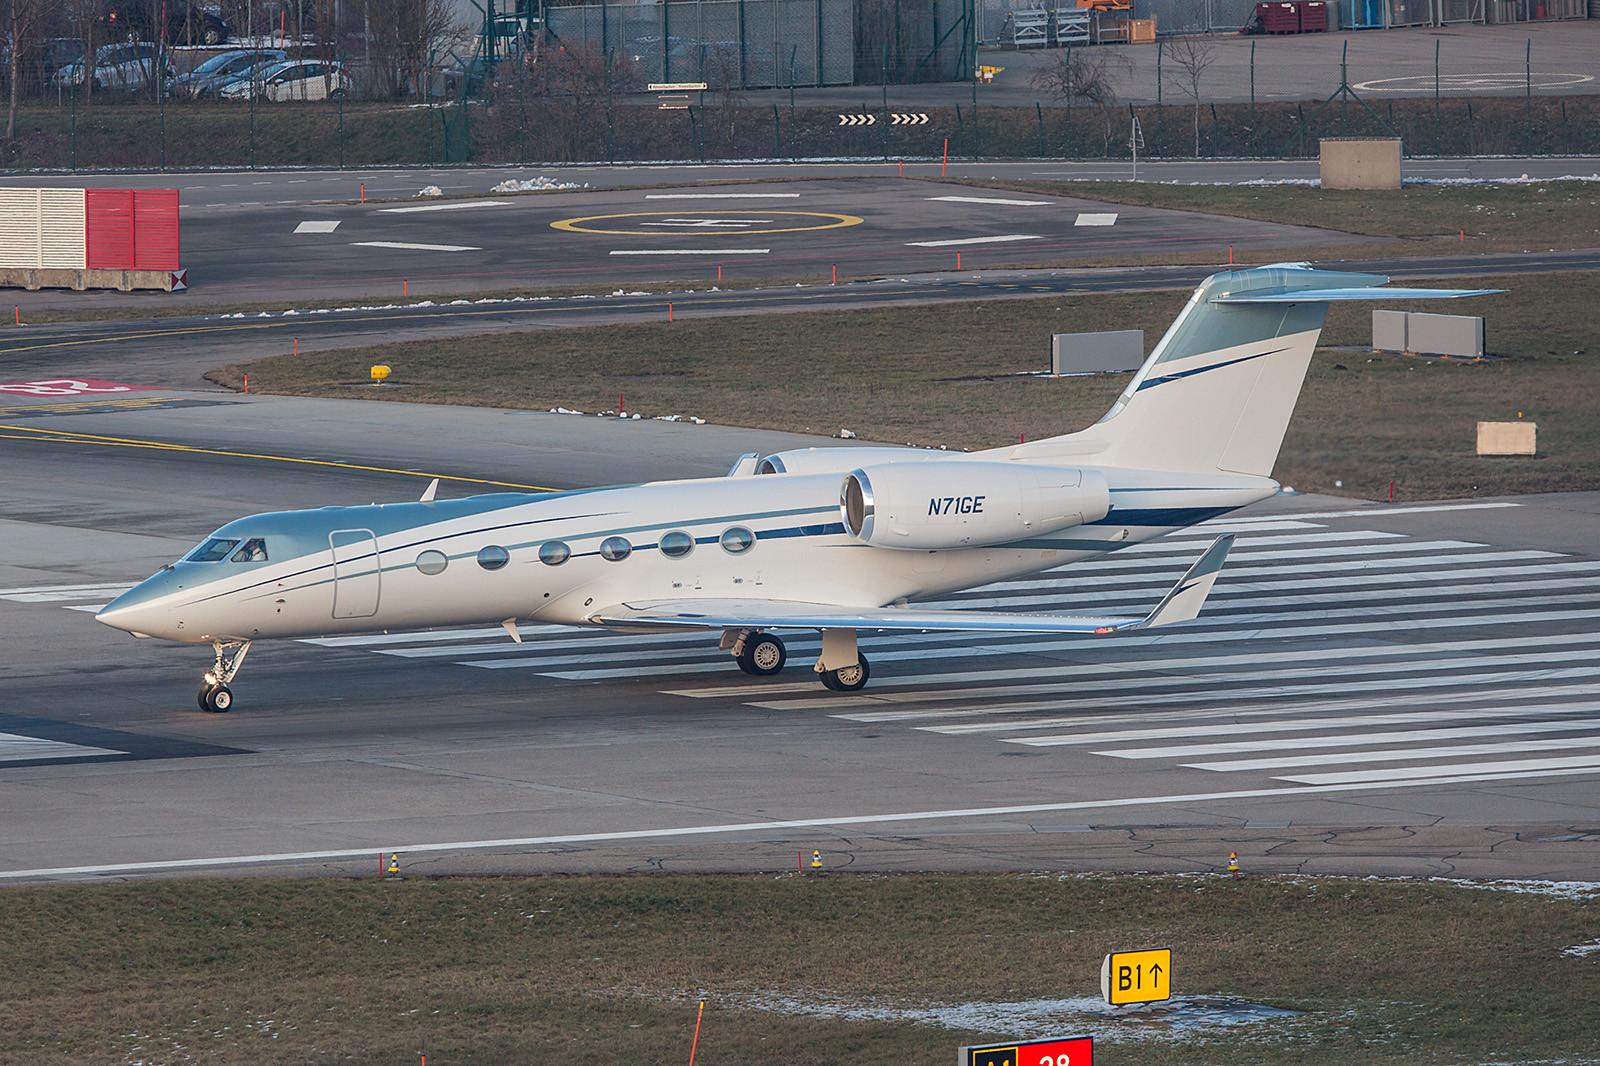 N71GE; Wilmington Trust Gulfstream G450